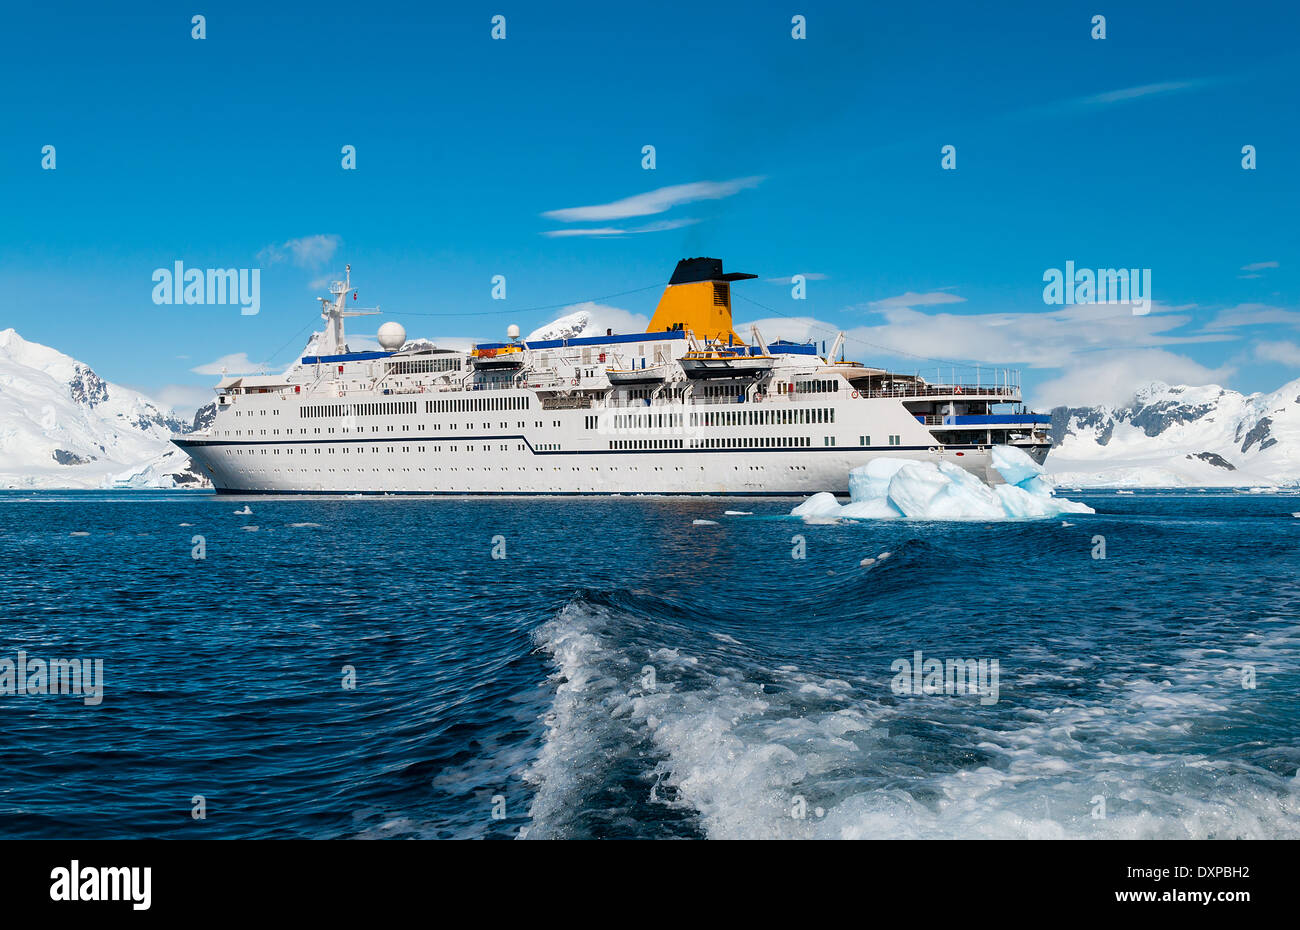 Cruise liner in Antarctica - Stock Image